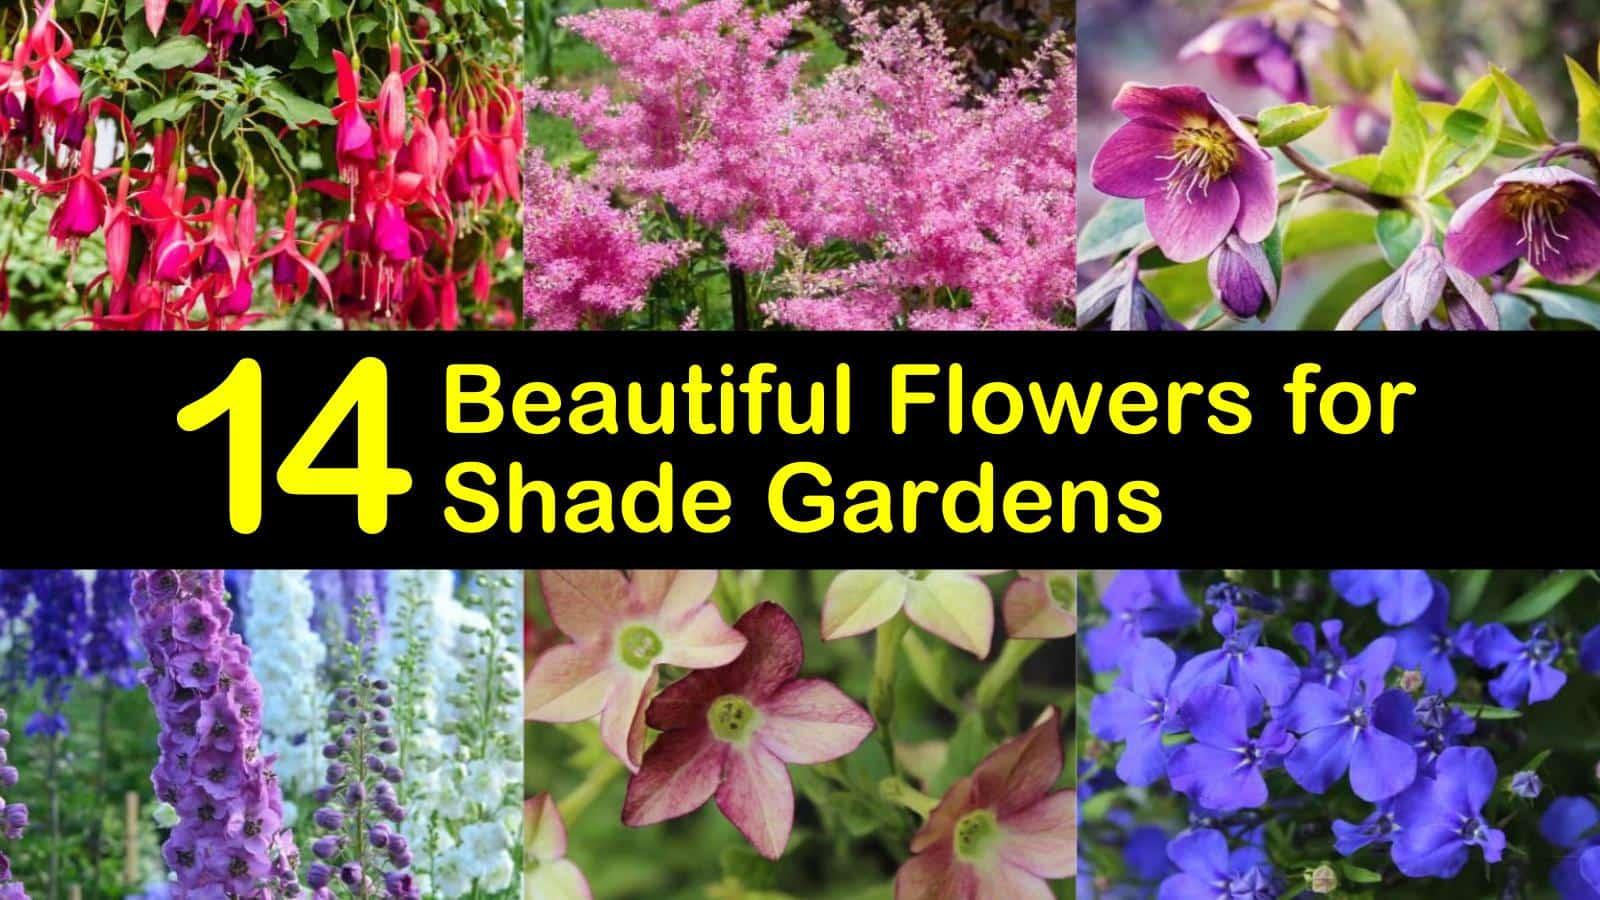 14 Beautiful Flowers For Shade Gardens